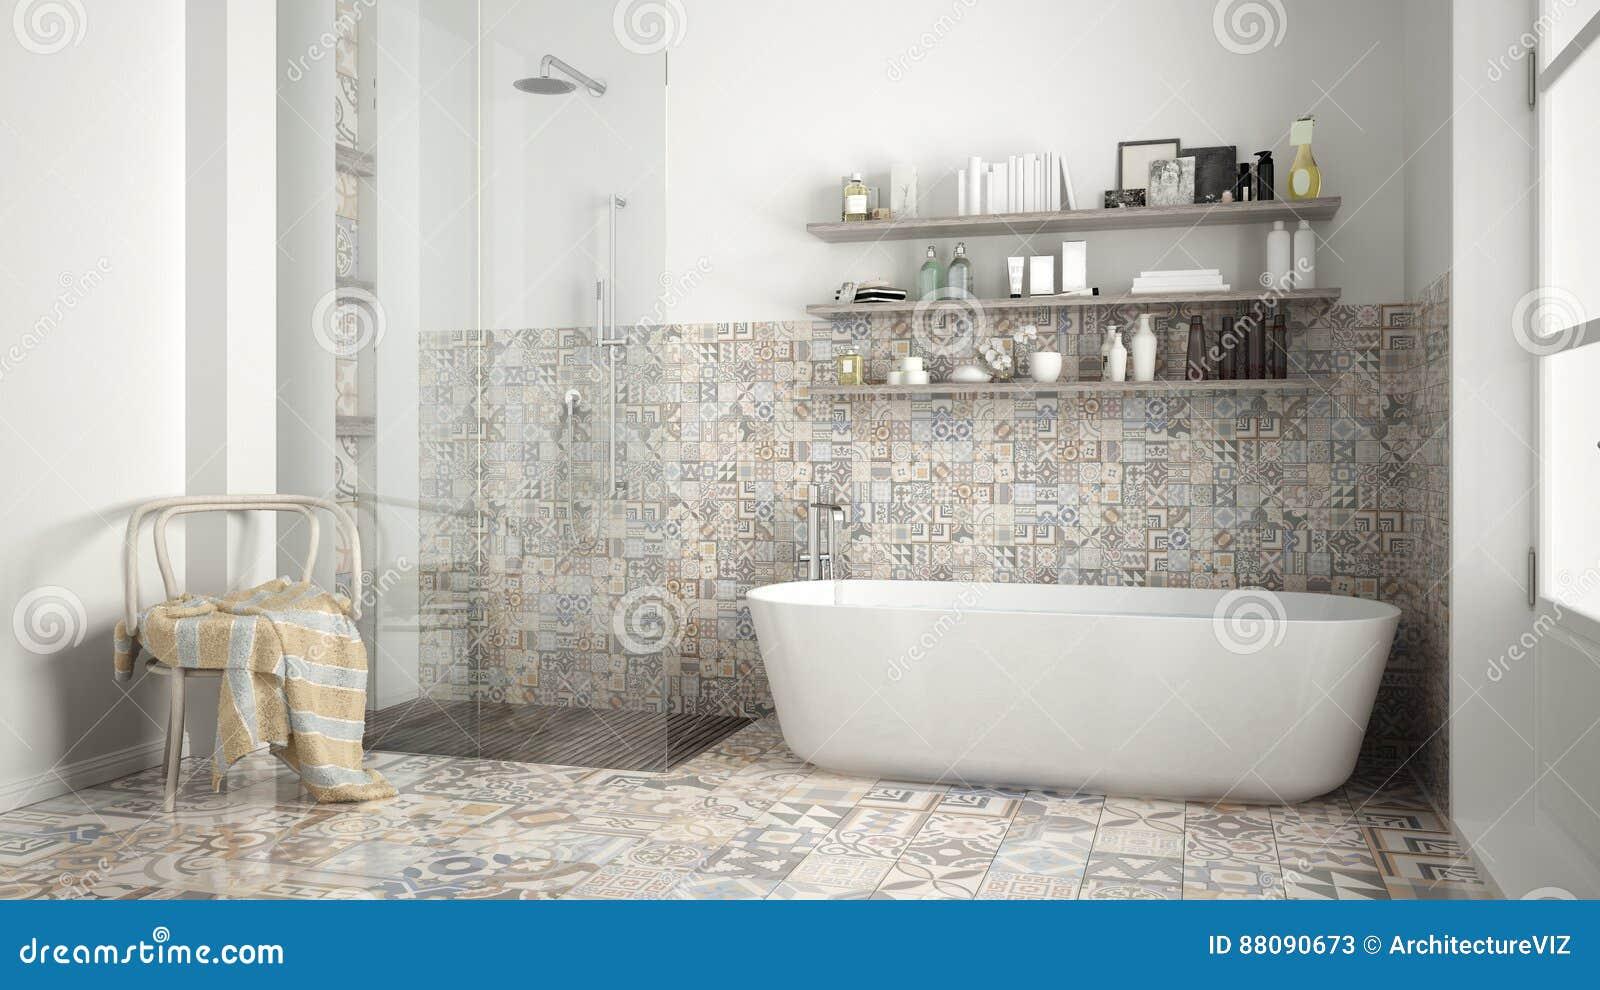 Bagno Design Scandinavo : Bagno scandinavo interior design dannata bianco classico immagine